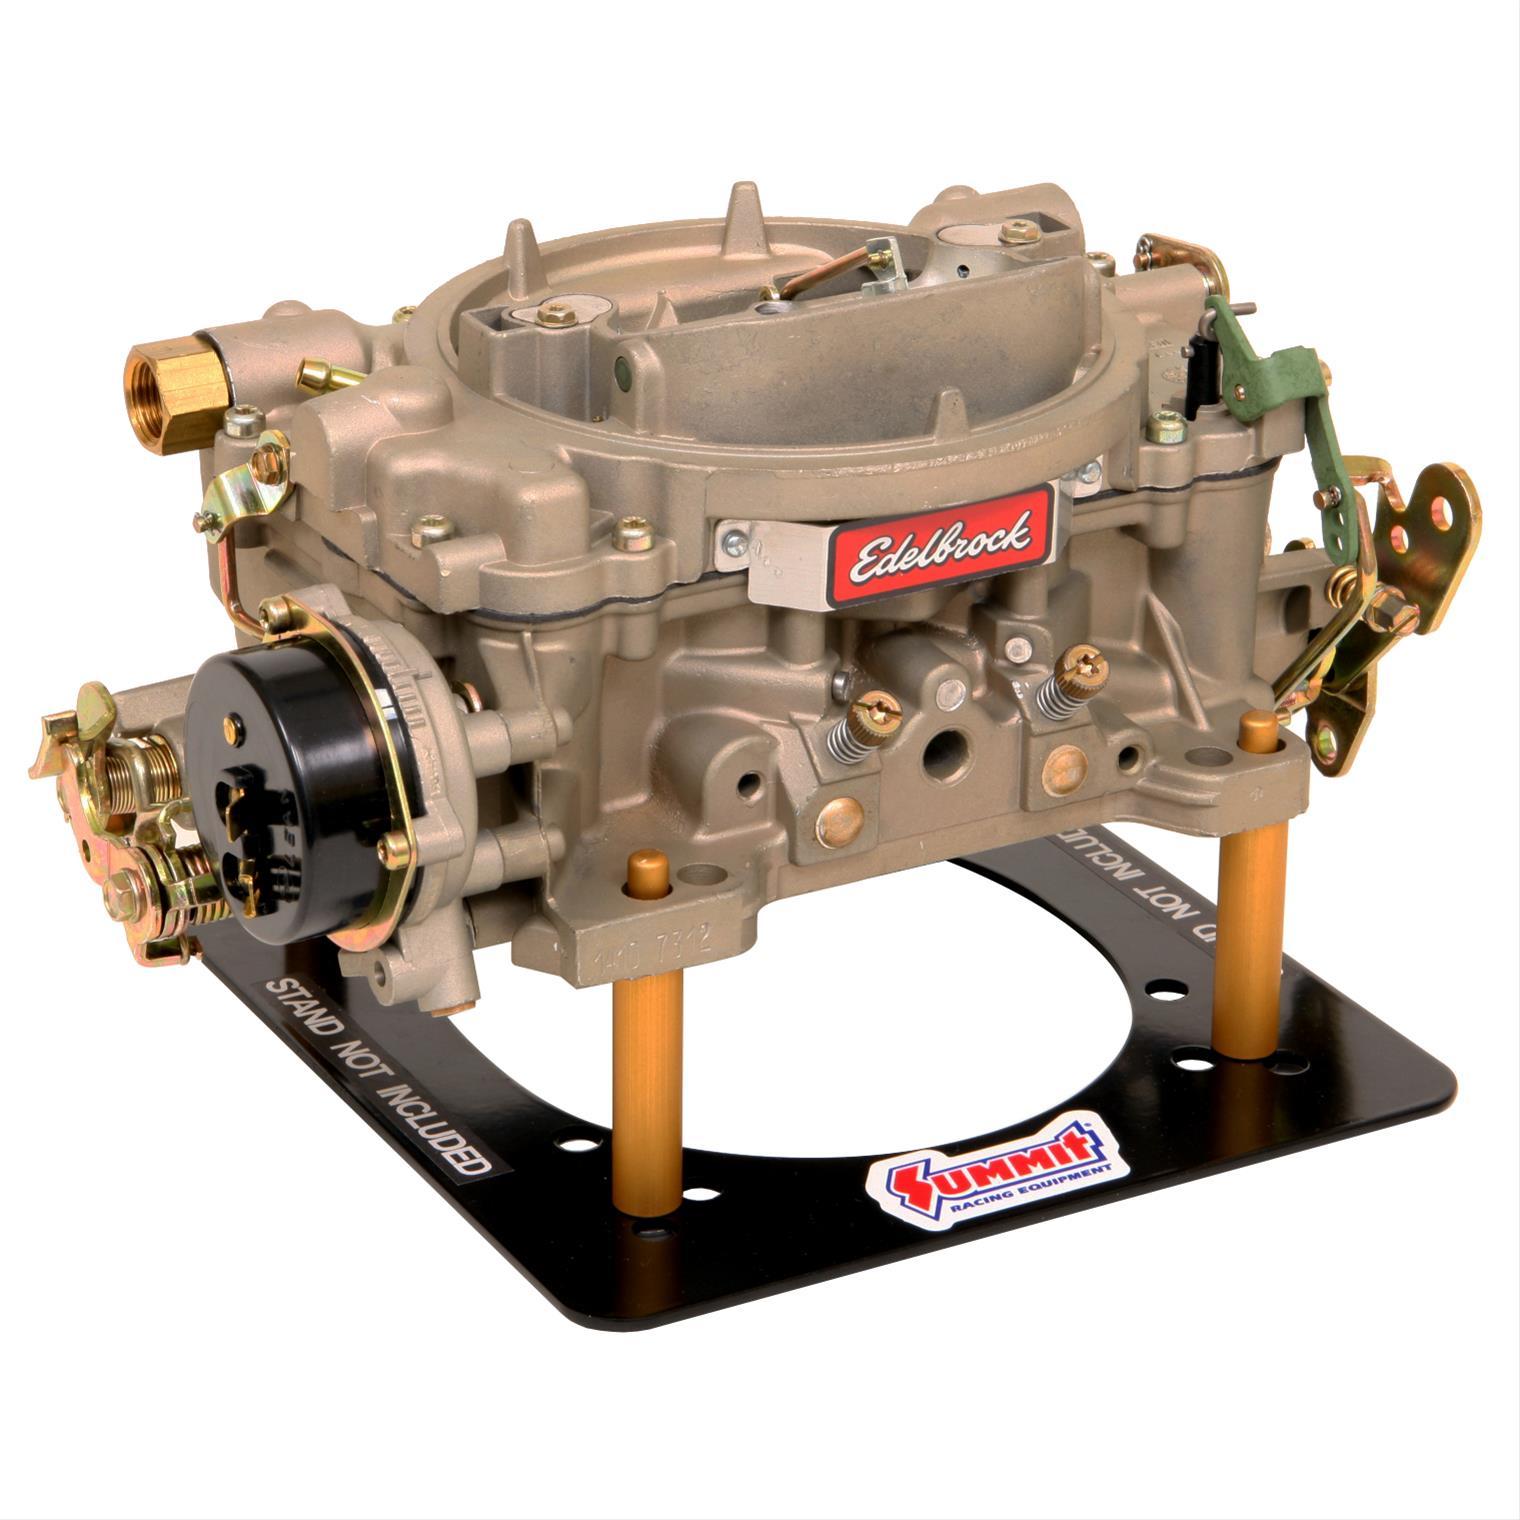 Edelbrock Marine Carburetors 1409